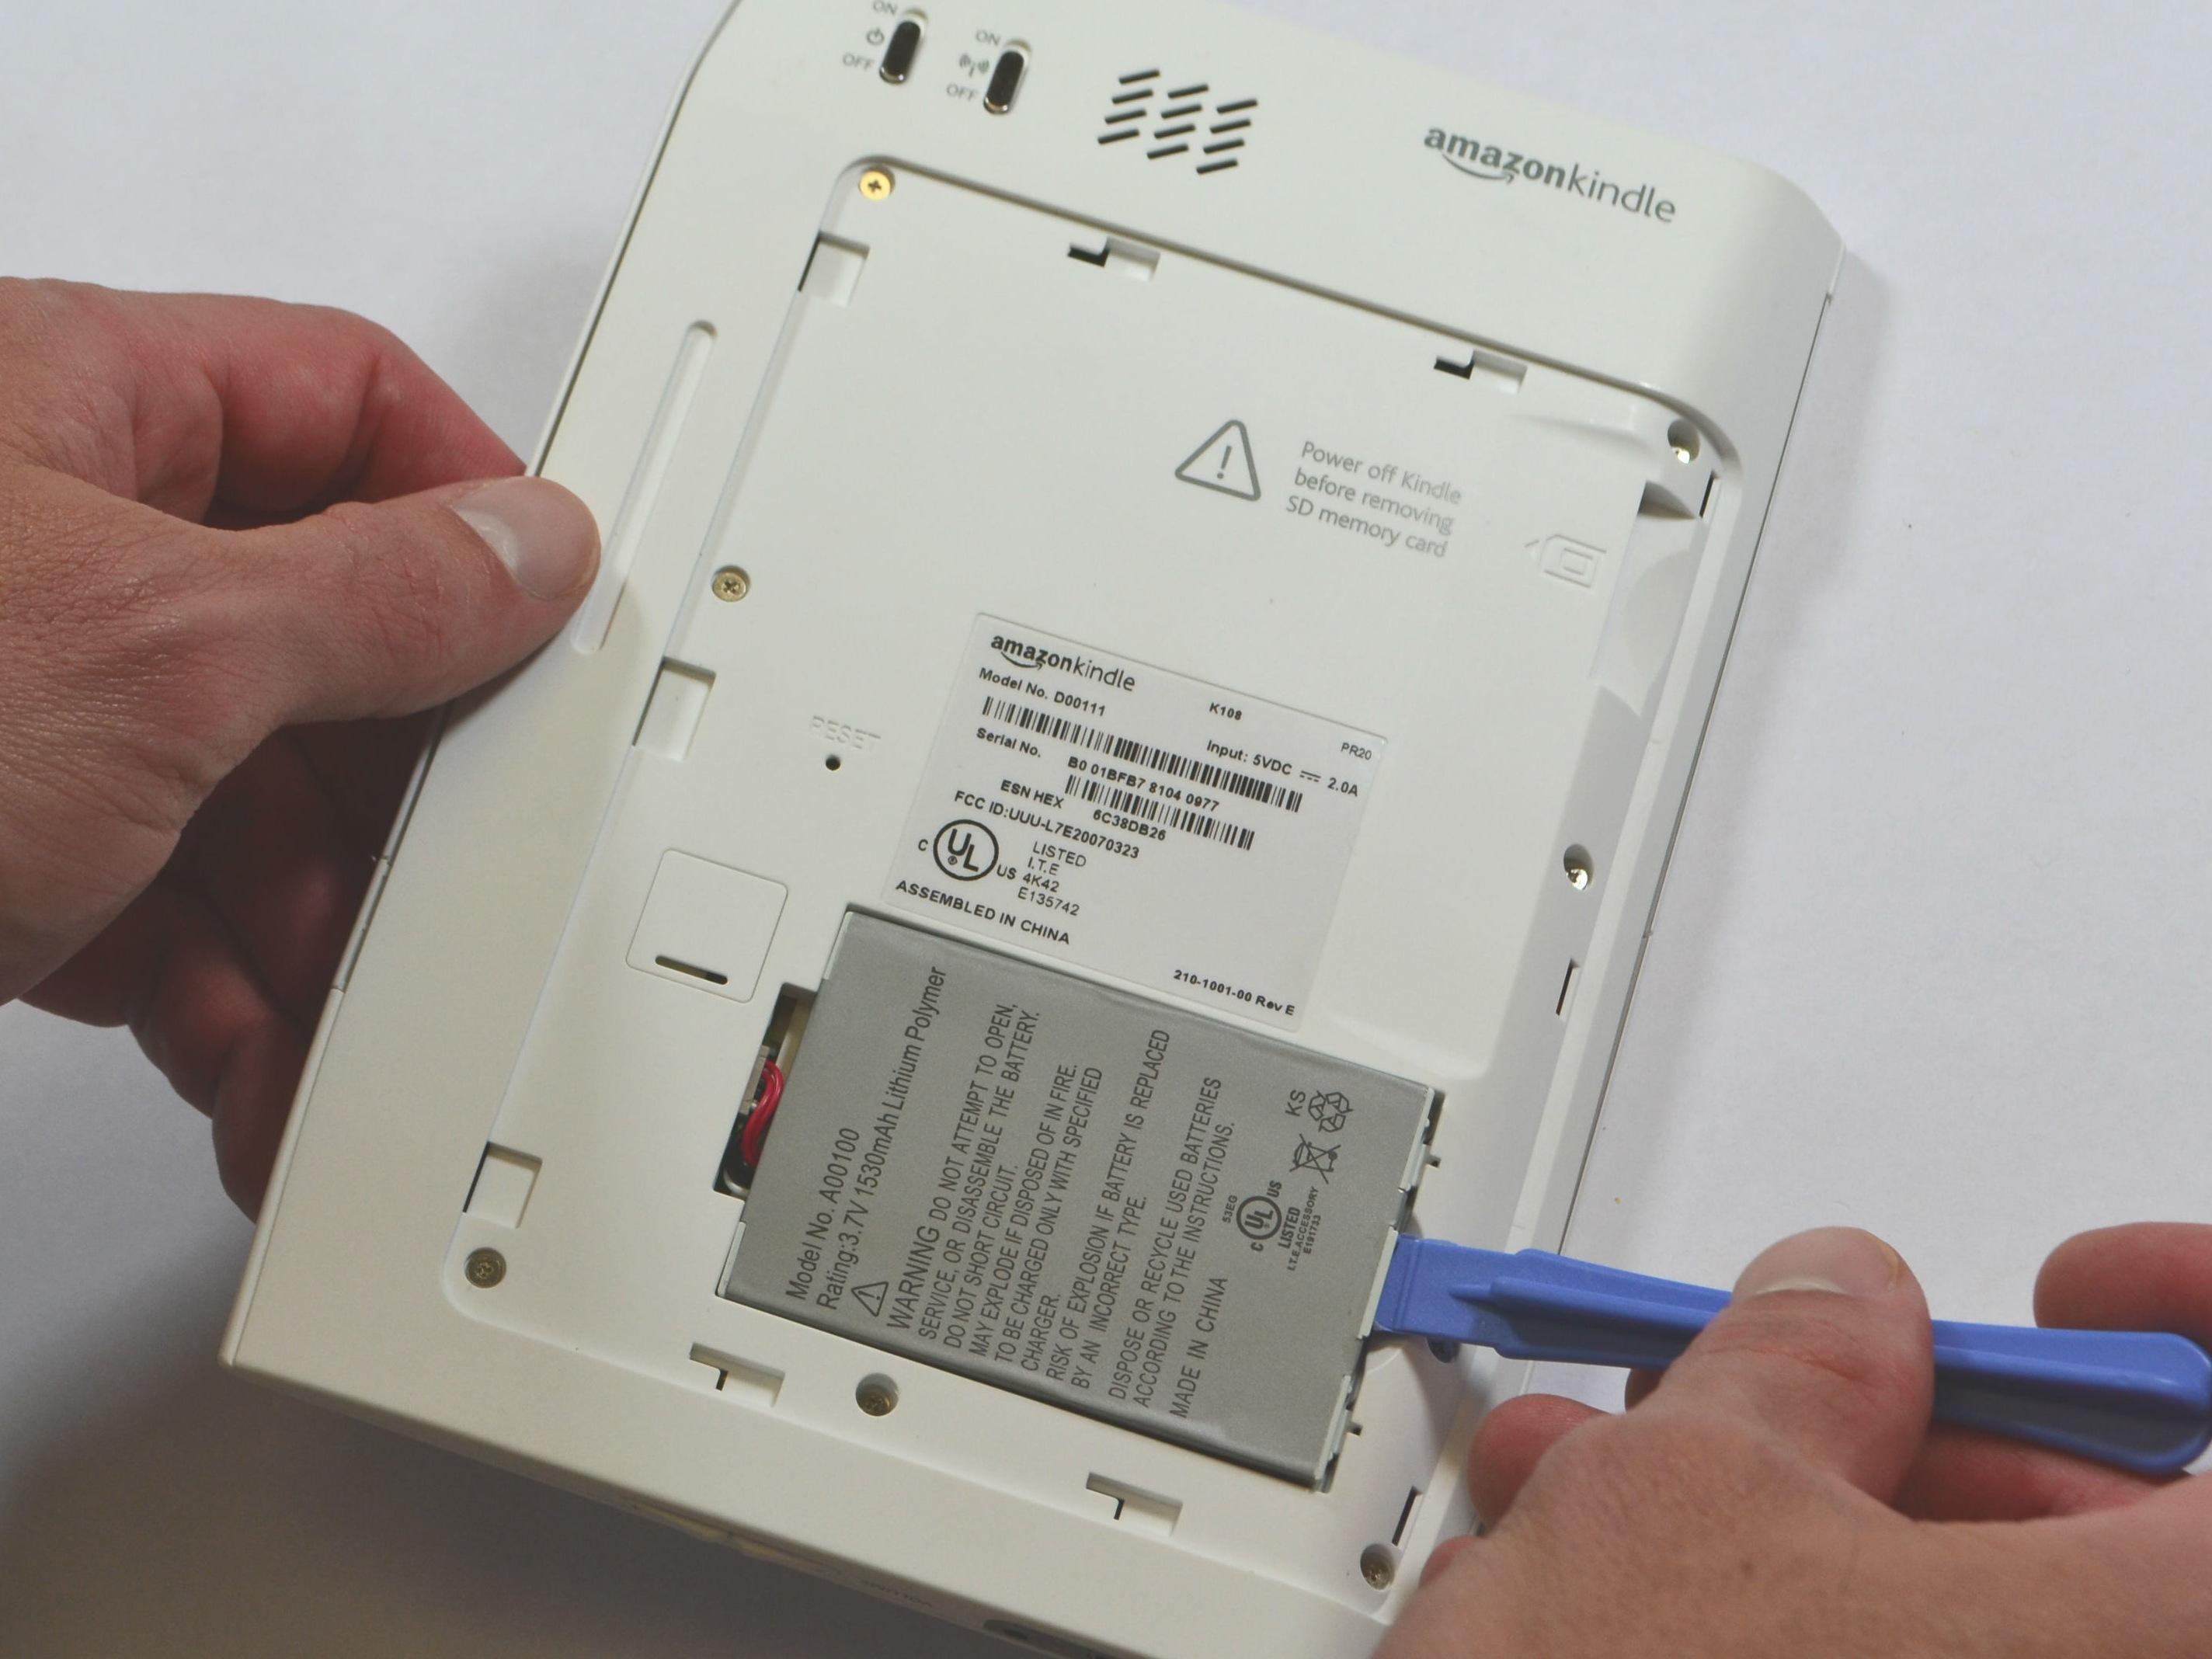 Kindle 1st Generation Repair - iFixit